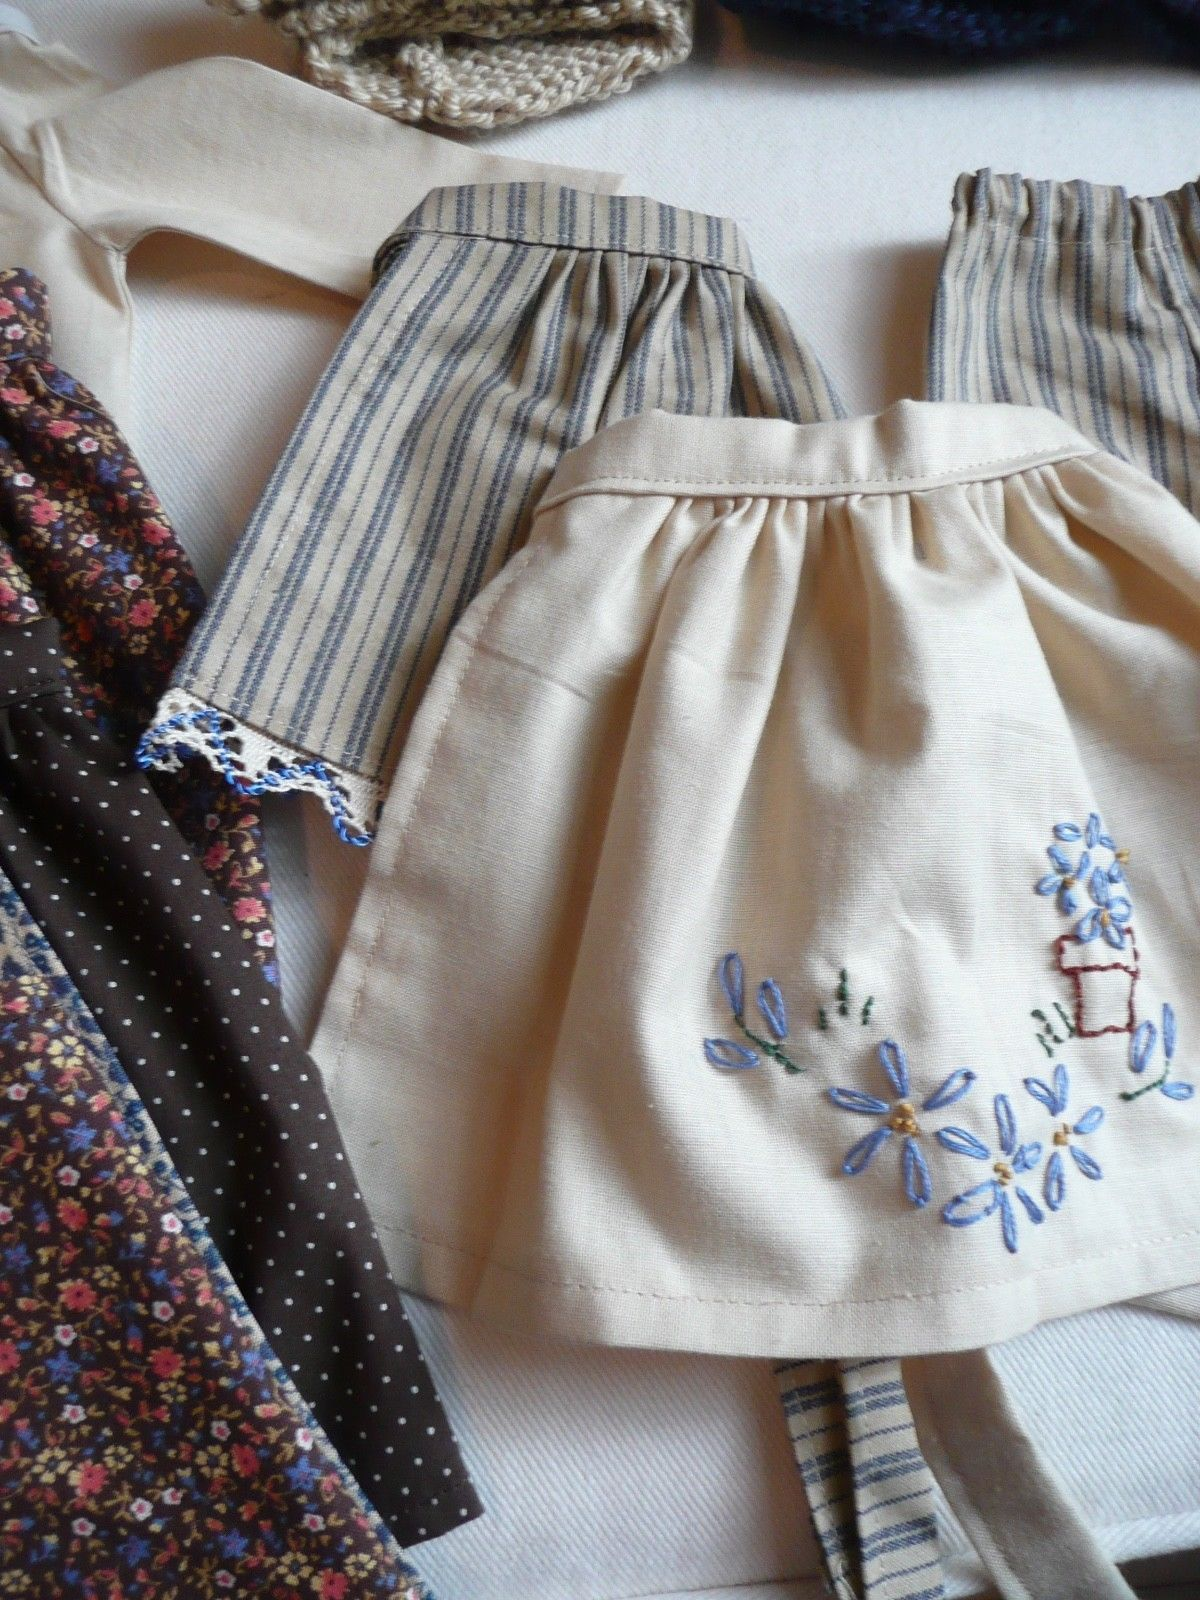 4531953f03e Sasha Farm child outfit - embroidered apron detail Embroidered Apron